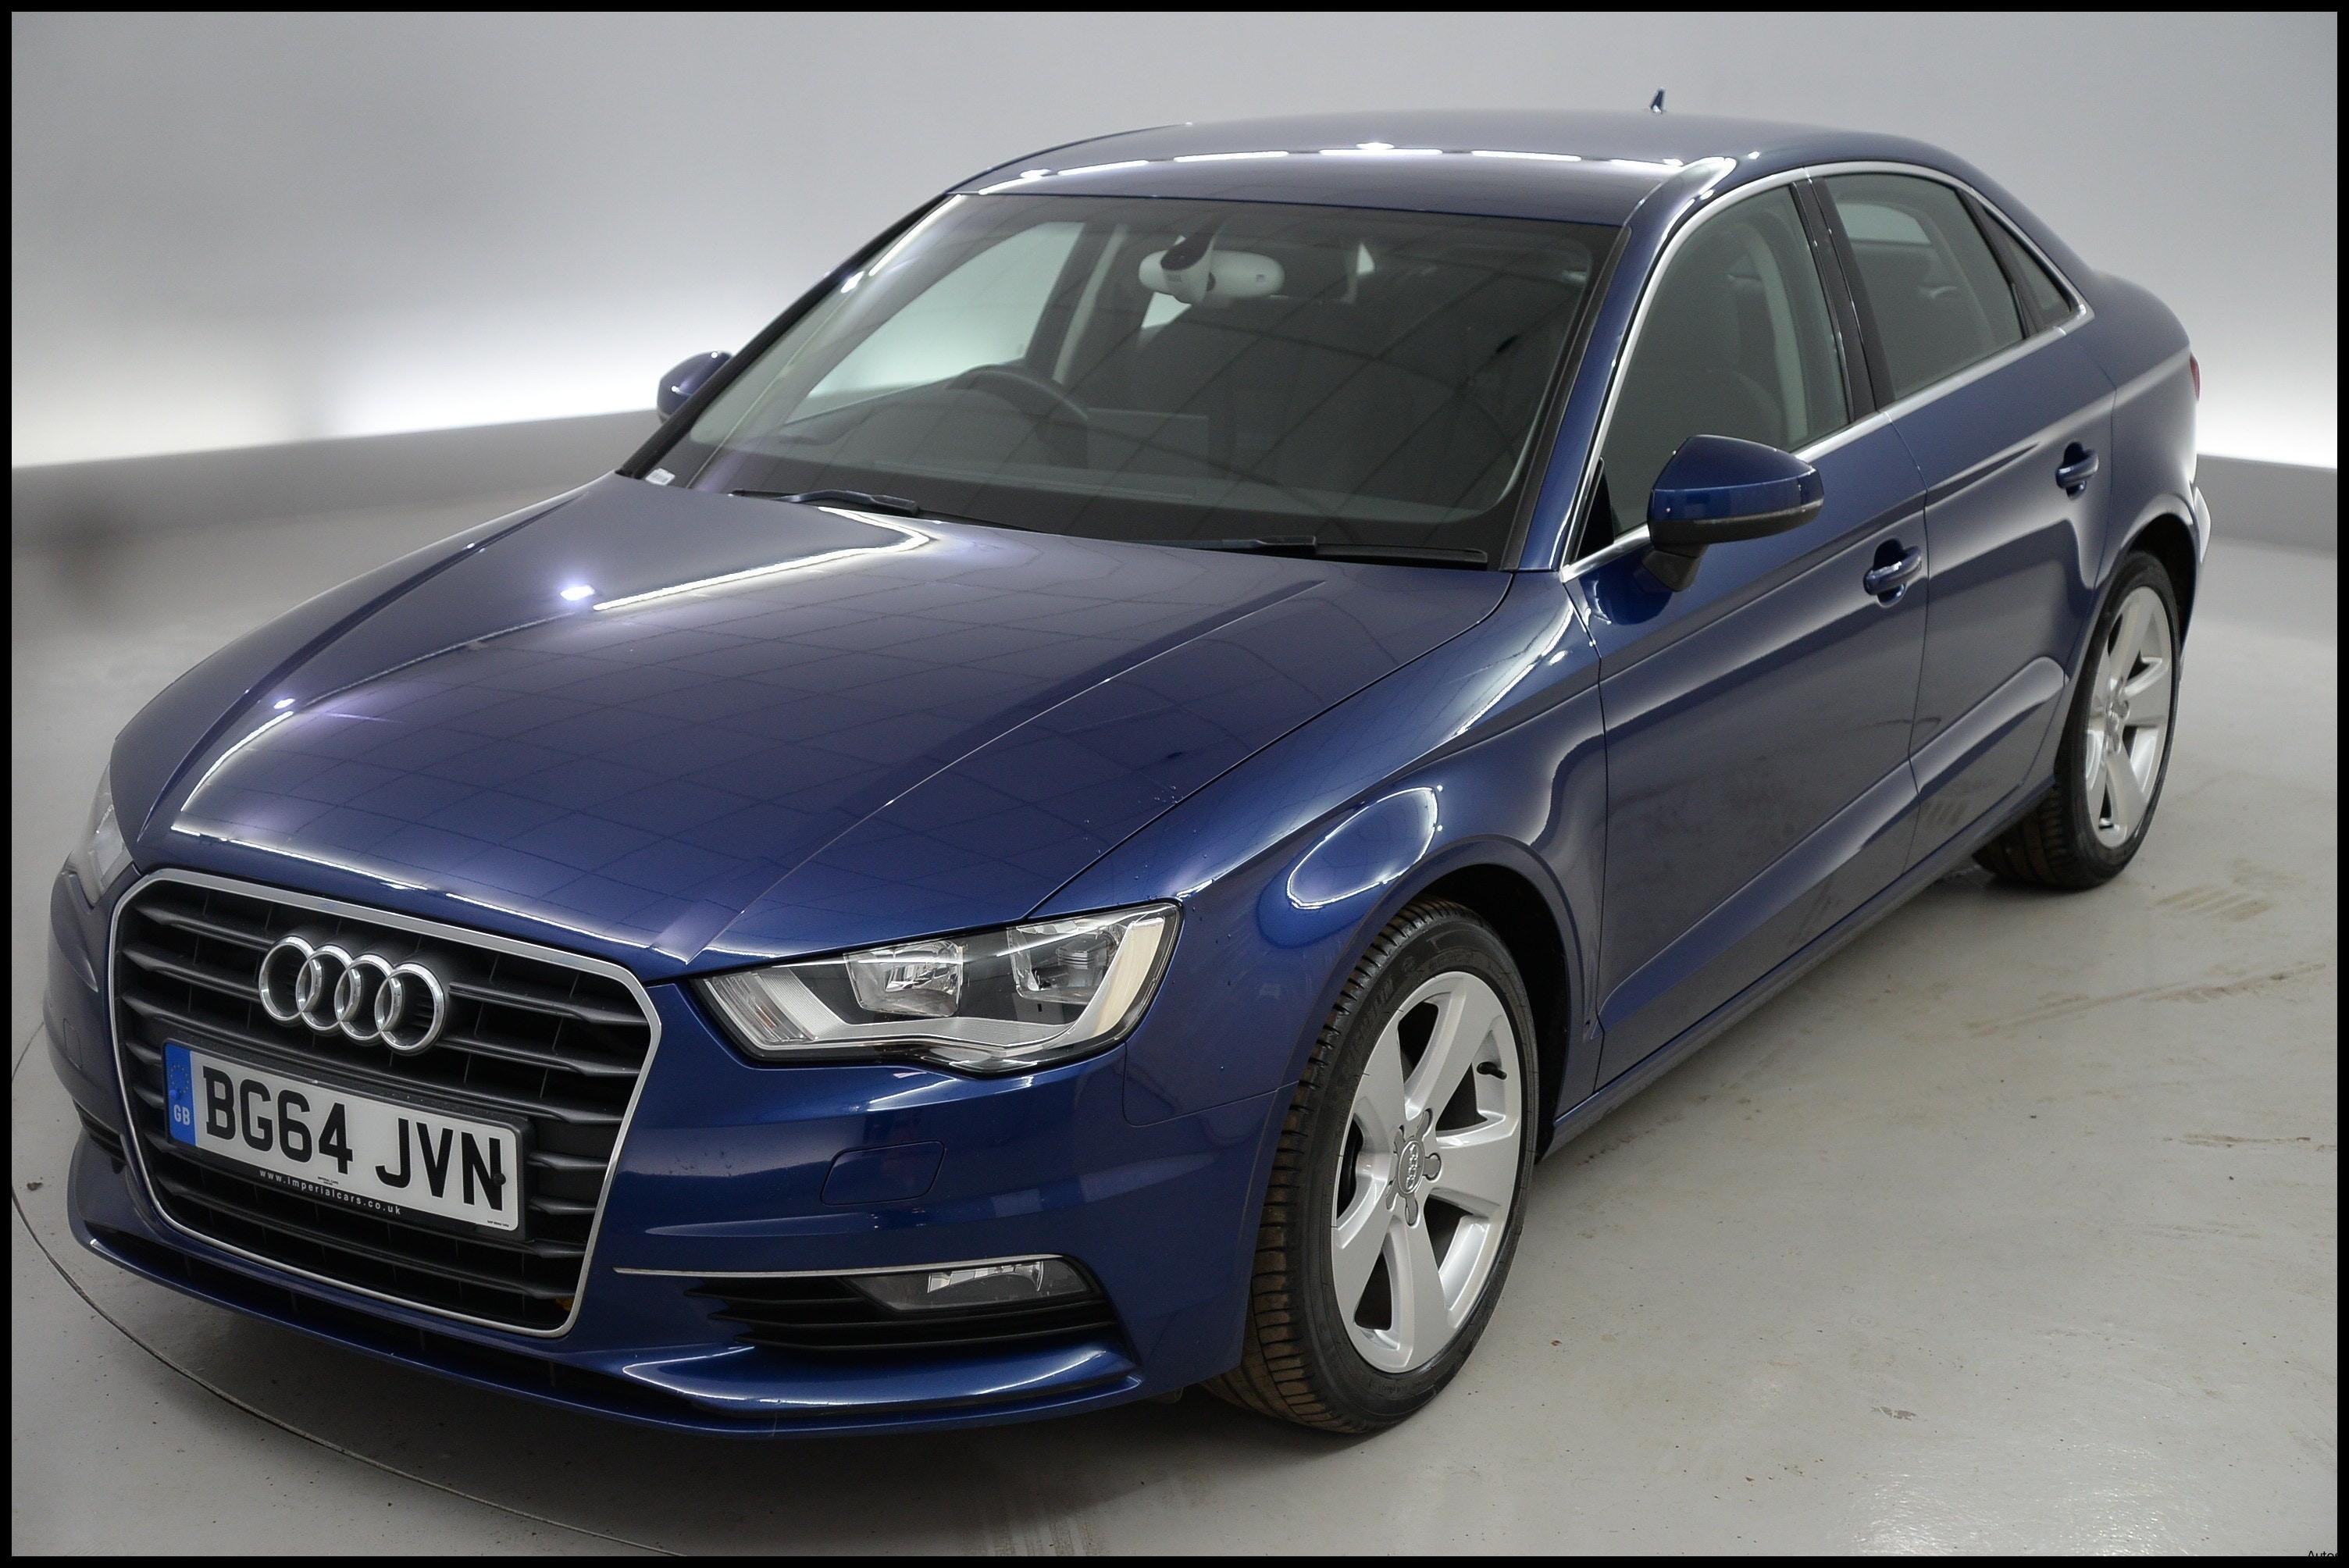 S3 Pricing Inspirational New Audi S3 Price Audi A3 Sedan 2014 1600 0d Auto Side 15